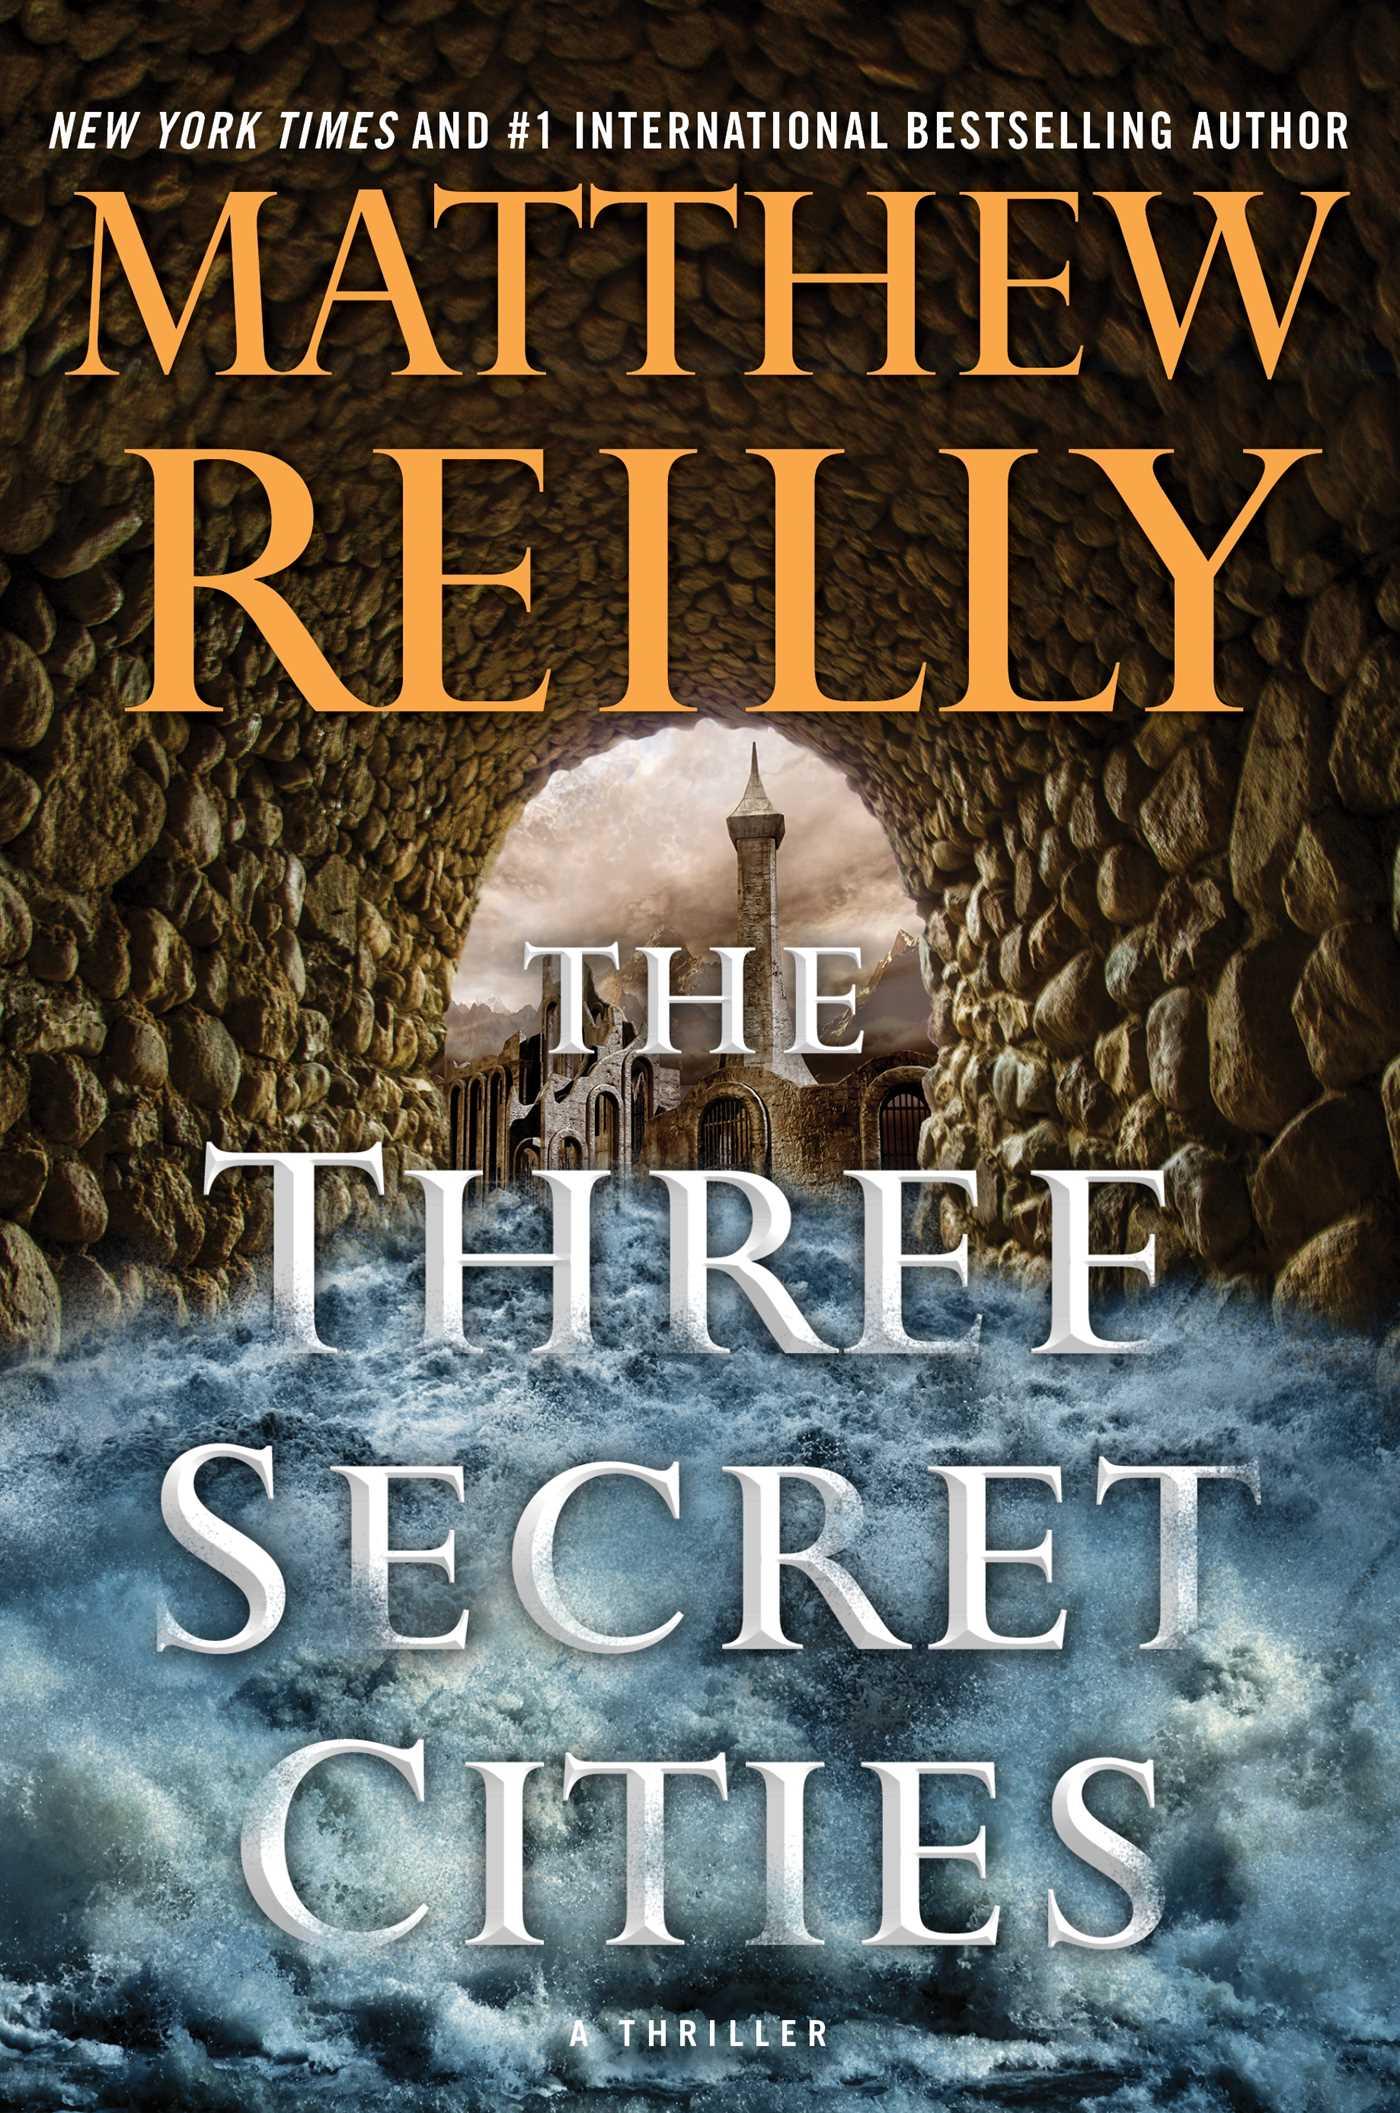 The three secret cities 9781501167195 hr